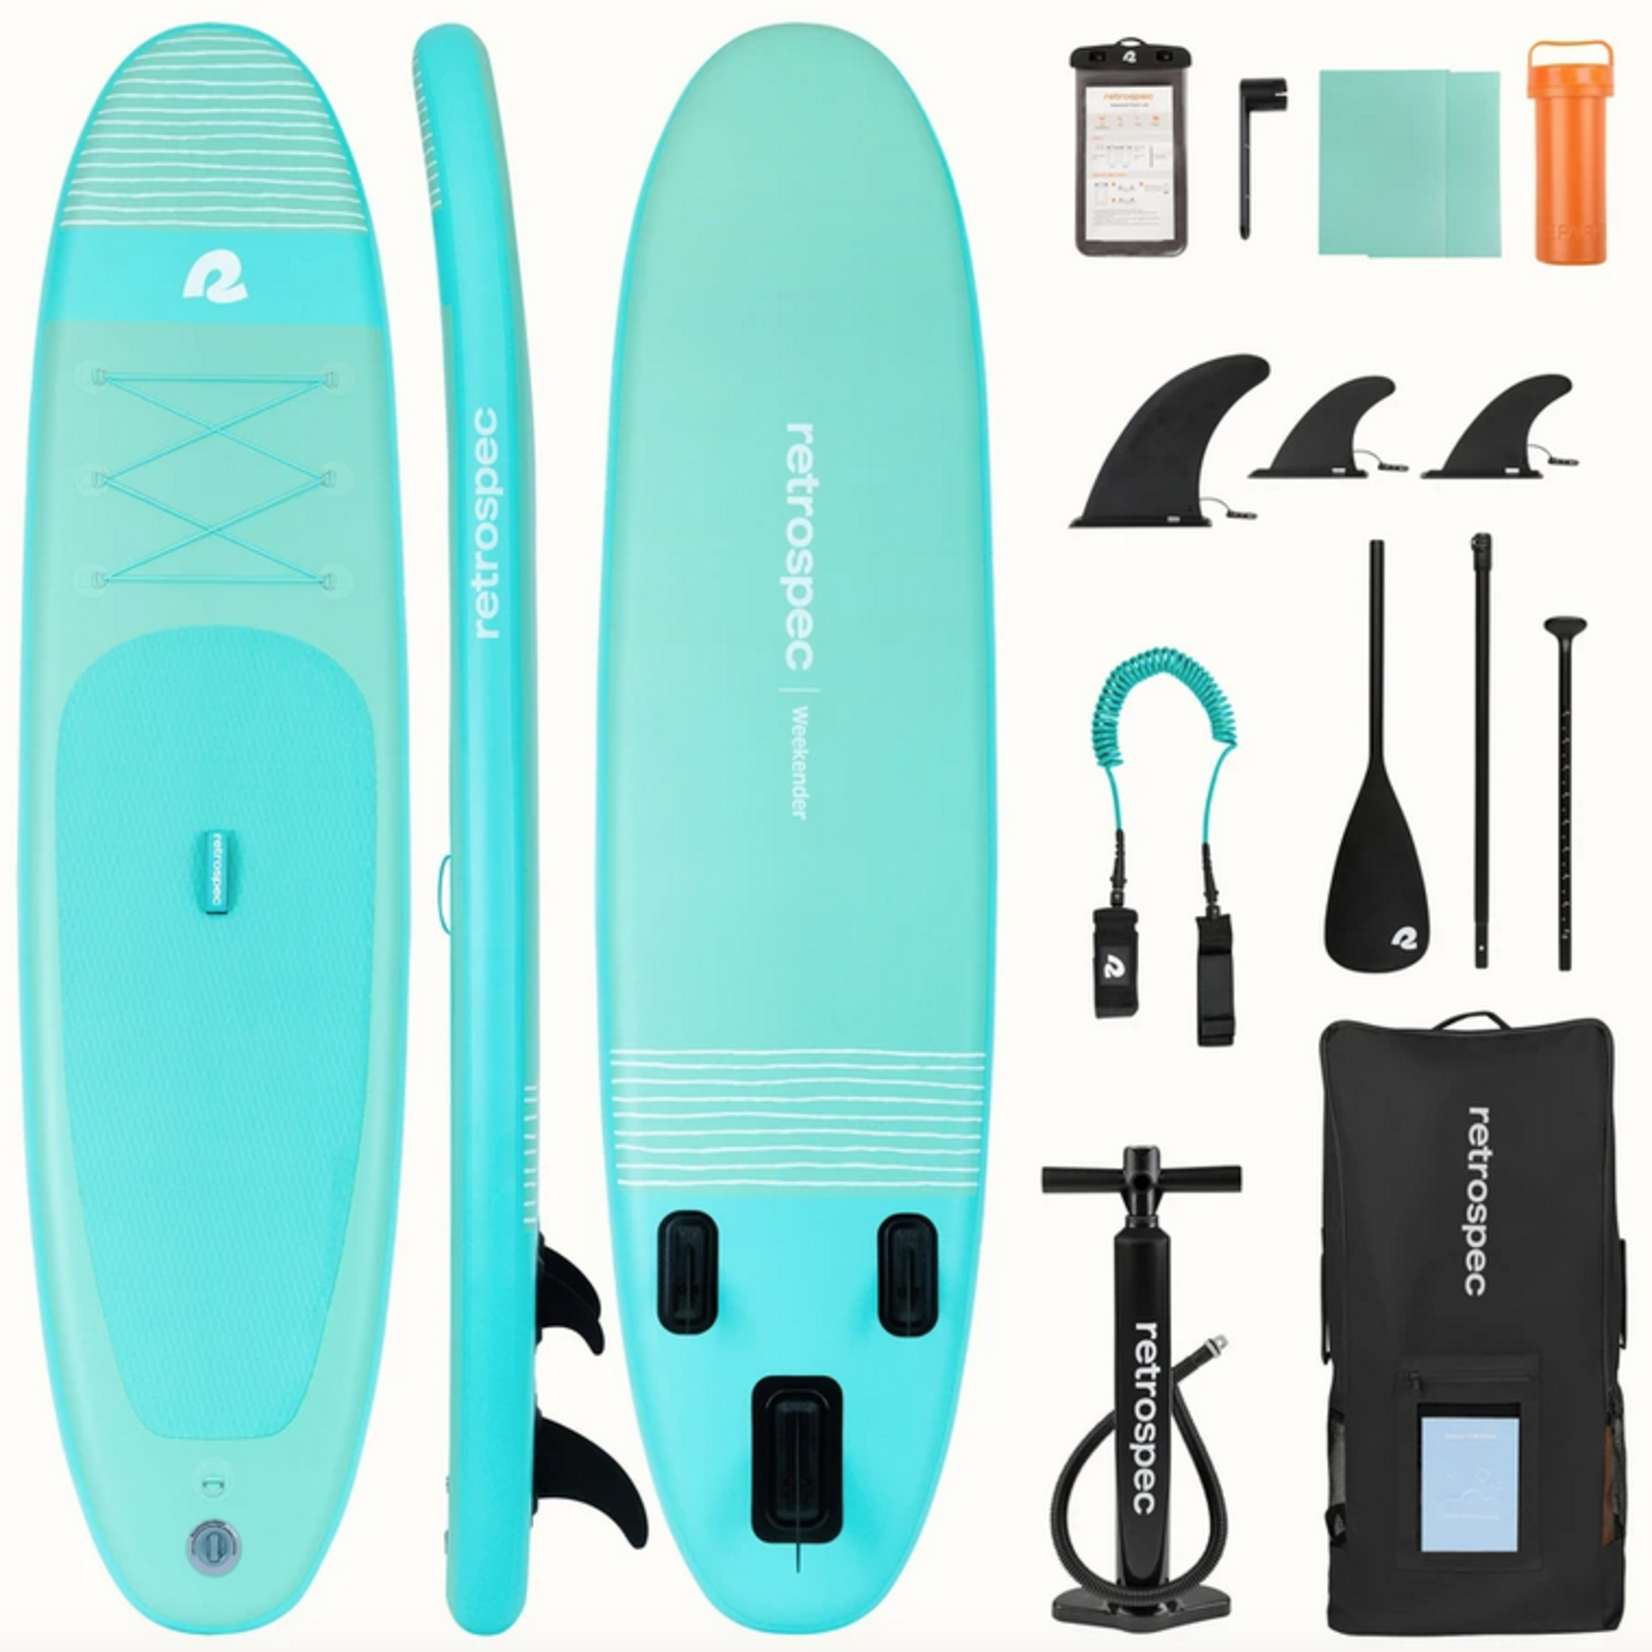 RetroSpec Retrospec Paddle - Weekender Inflatable Paddle Board 10'